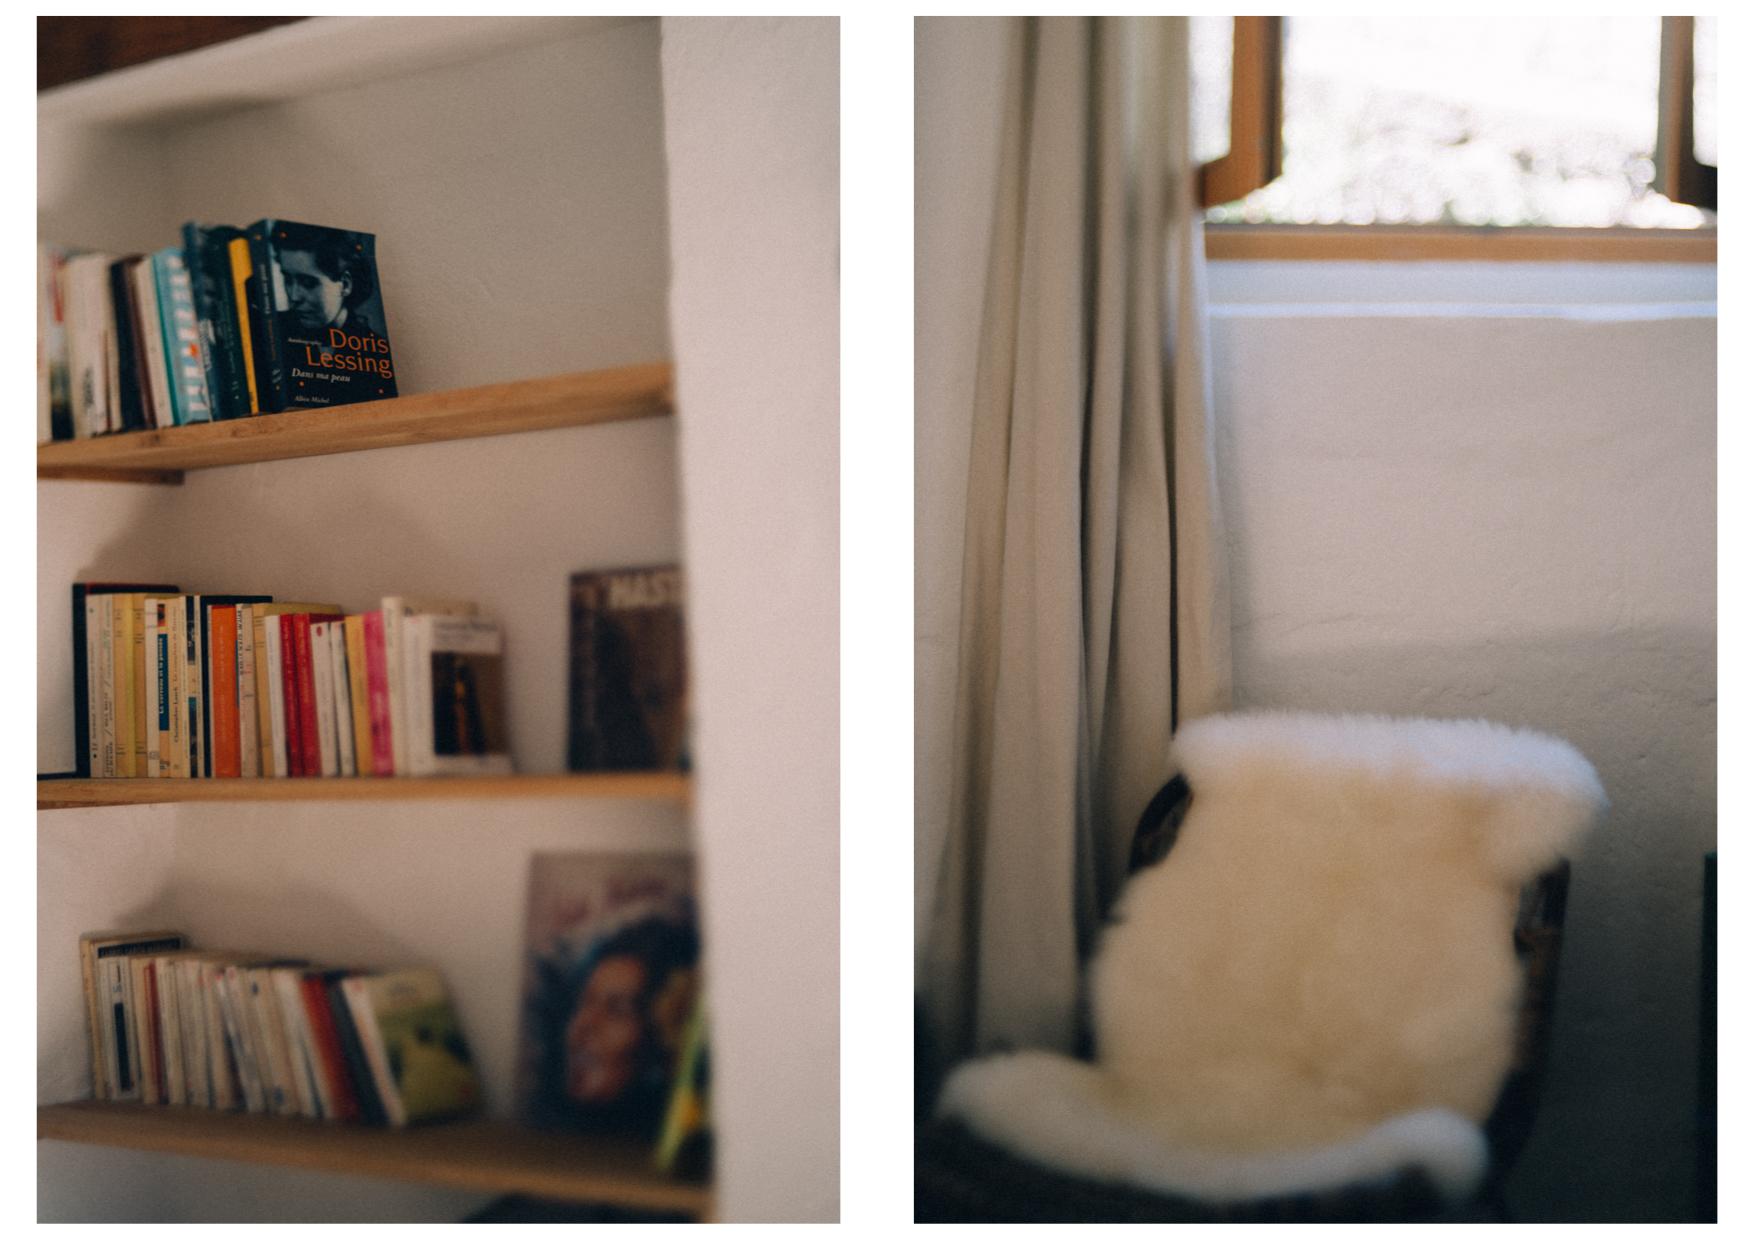 Aussteiger, Mutter, Fotoprojekt, Kathrin Stahl